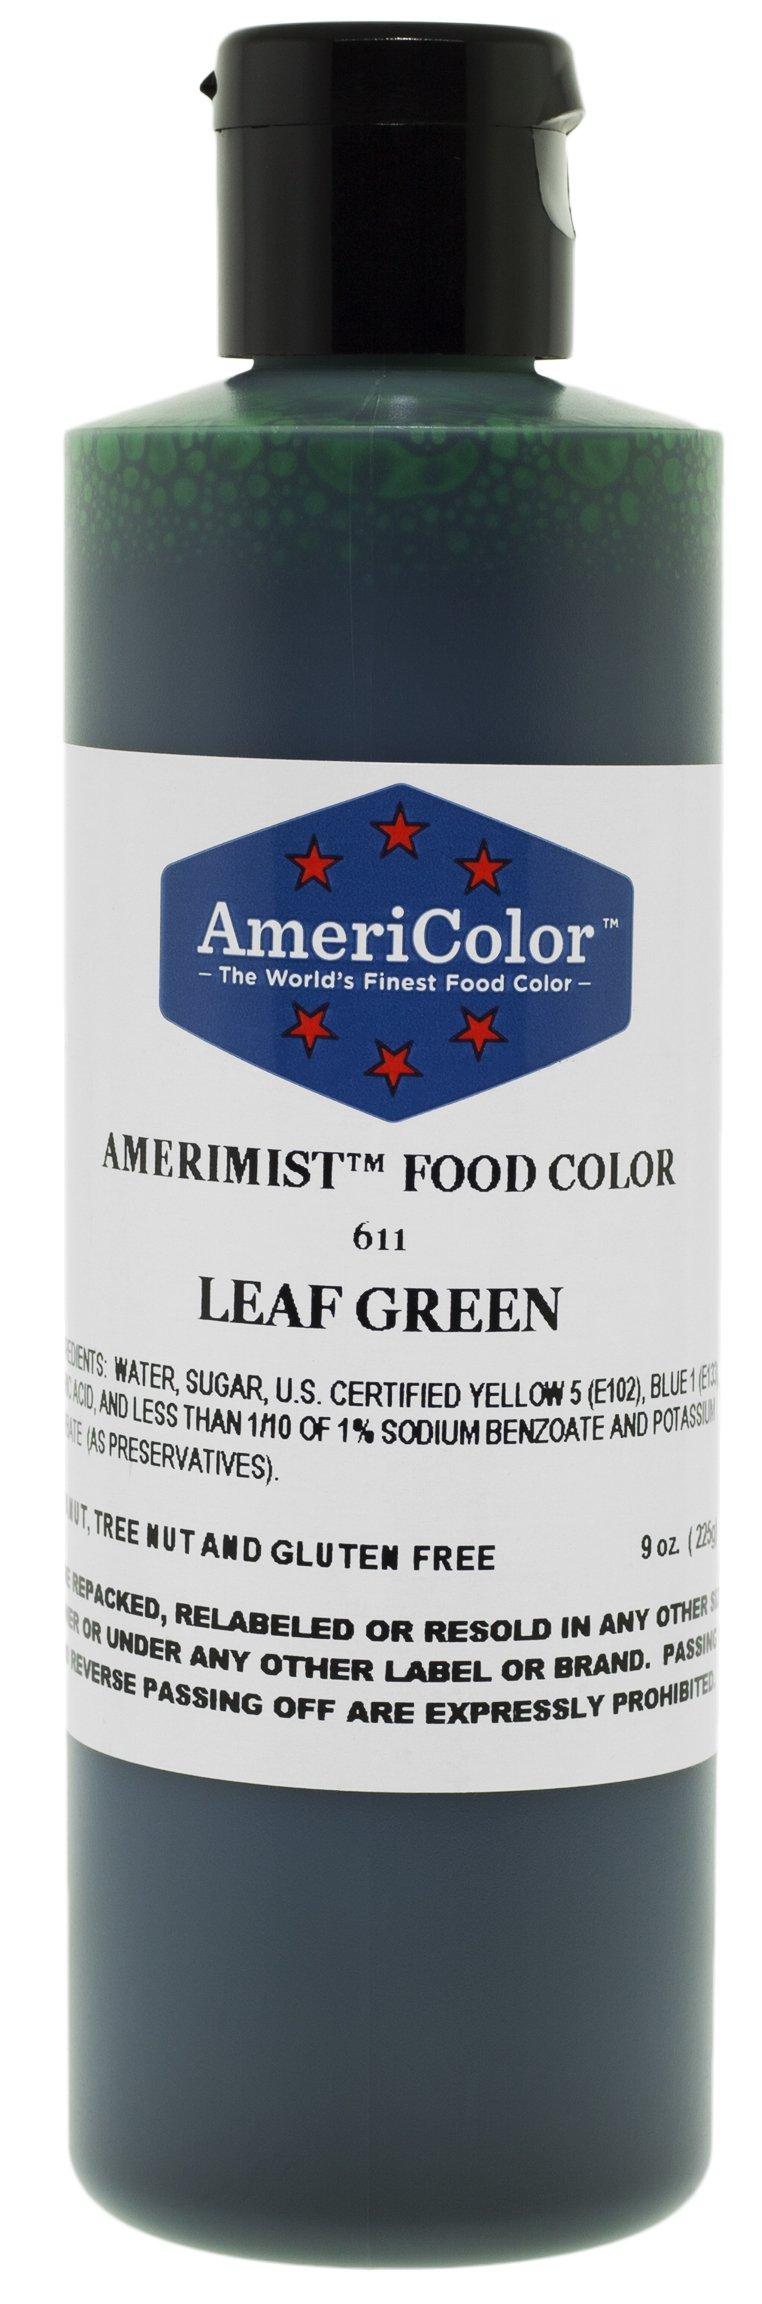 AmeriColor AmeriMist Leaf Green Airbrush Food Color, 9 oz